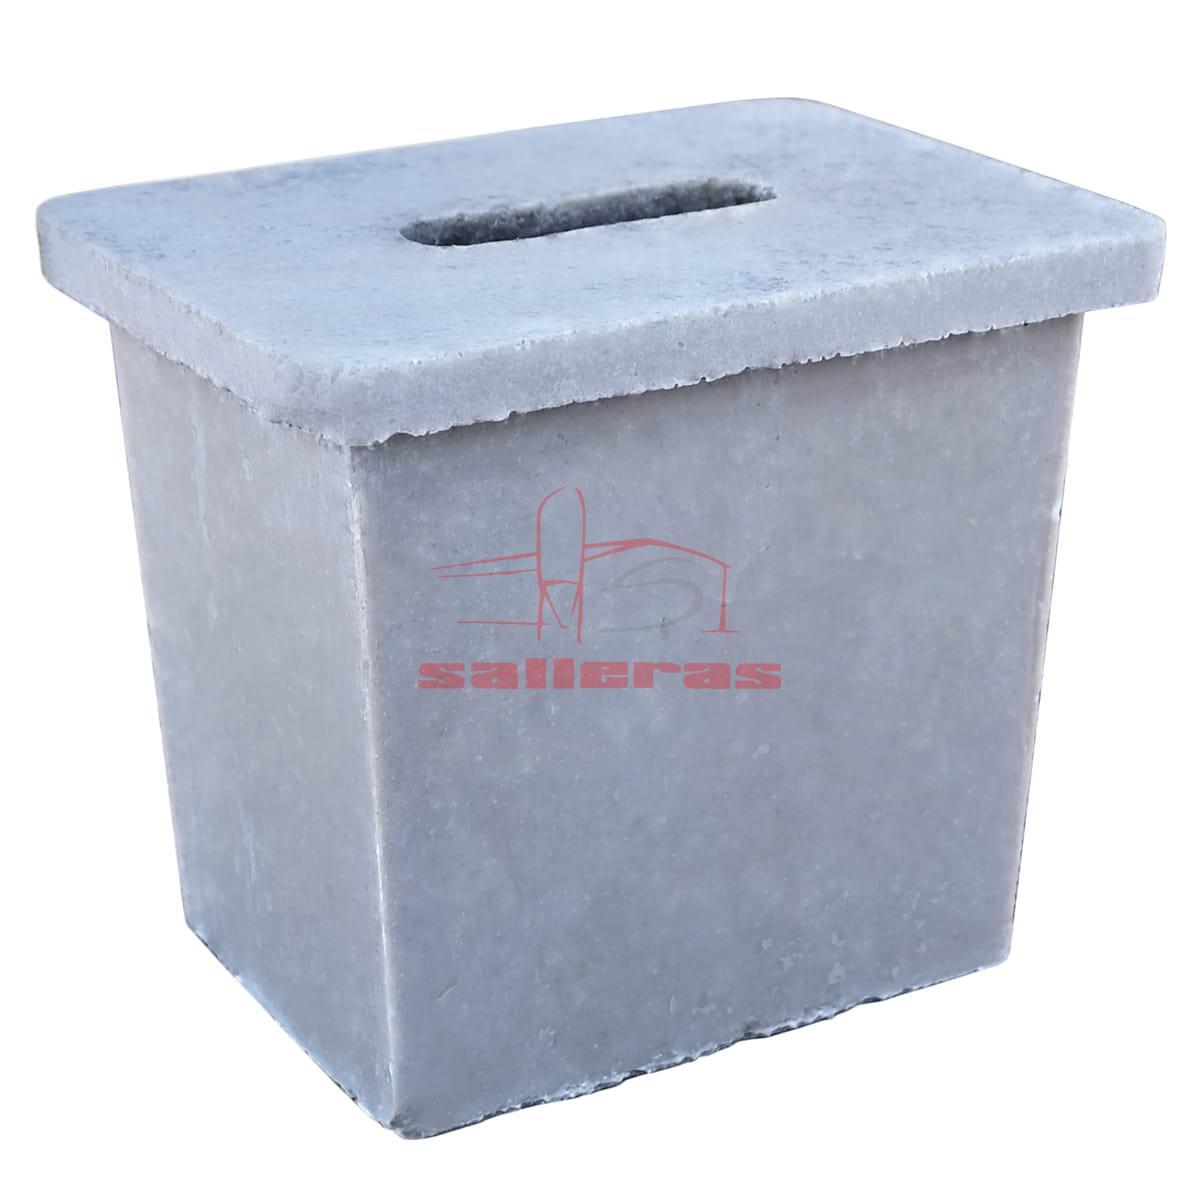 Tapon rectangular de polimero para desague